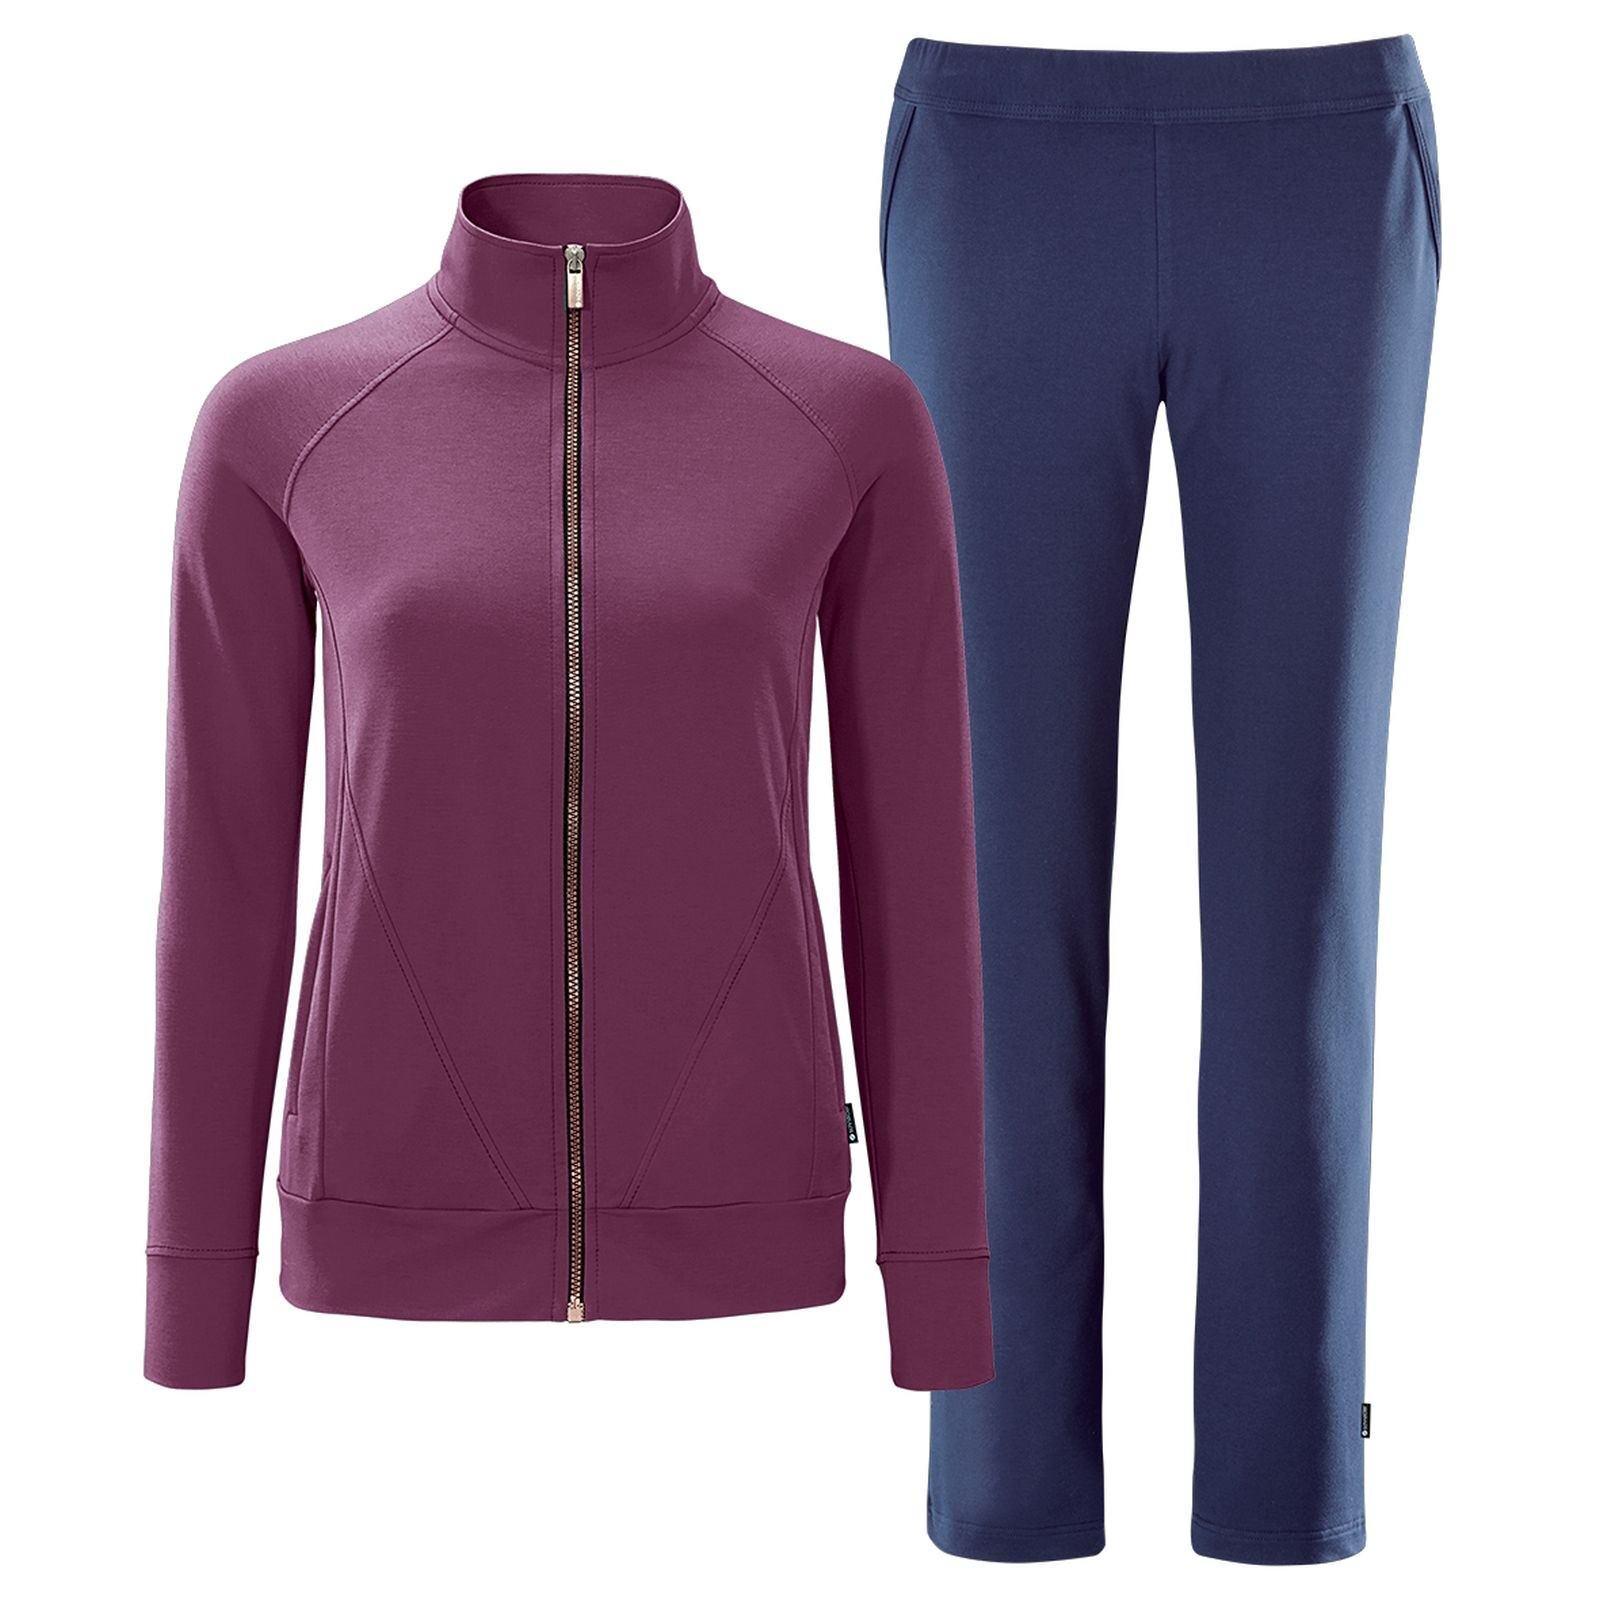 Schneider Sportswear Donna Tuta Fitness keaw VIOLA BLU